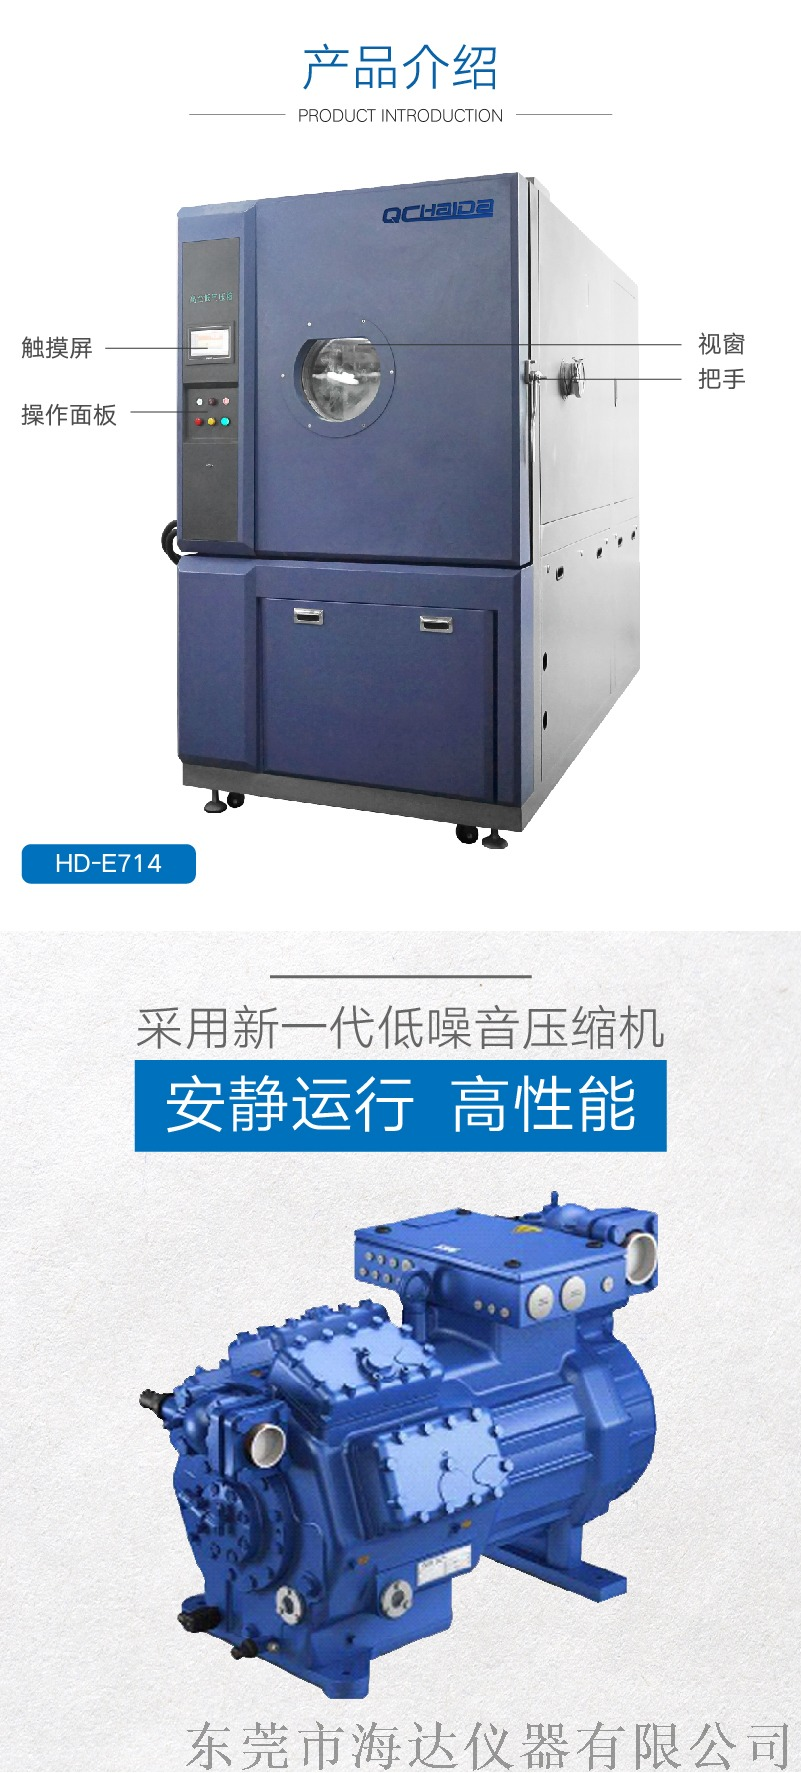 HD-E714高空低气压试验机 (2).jpg